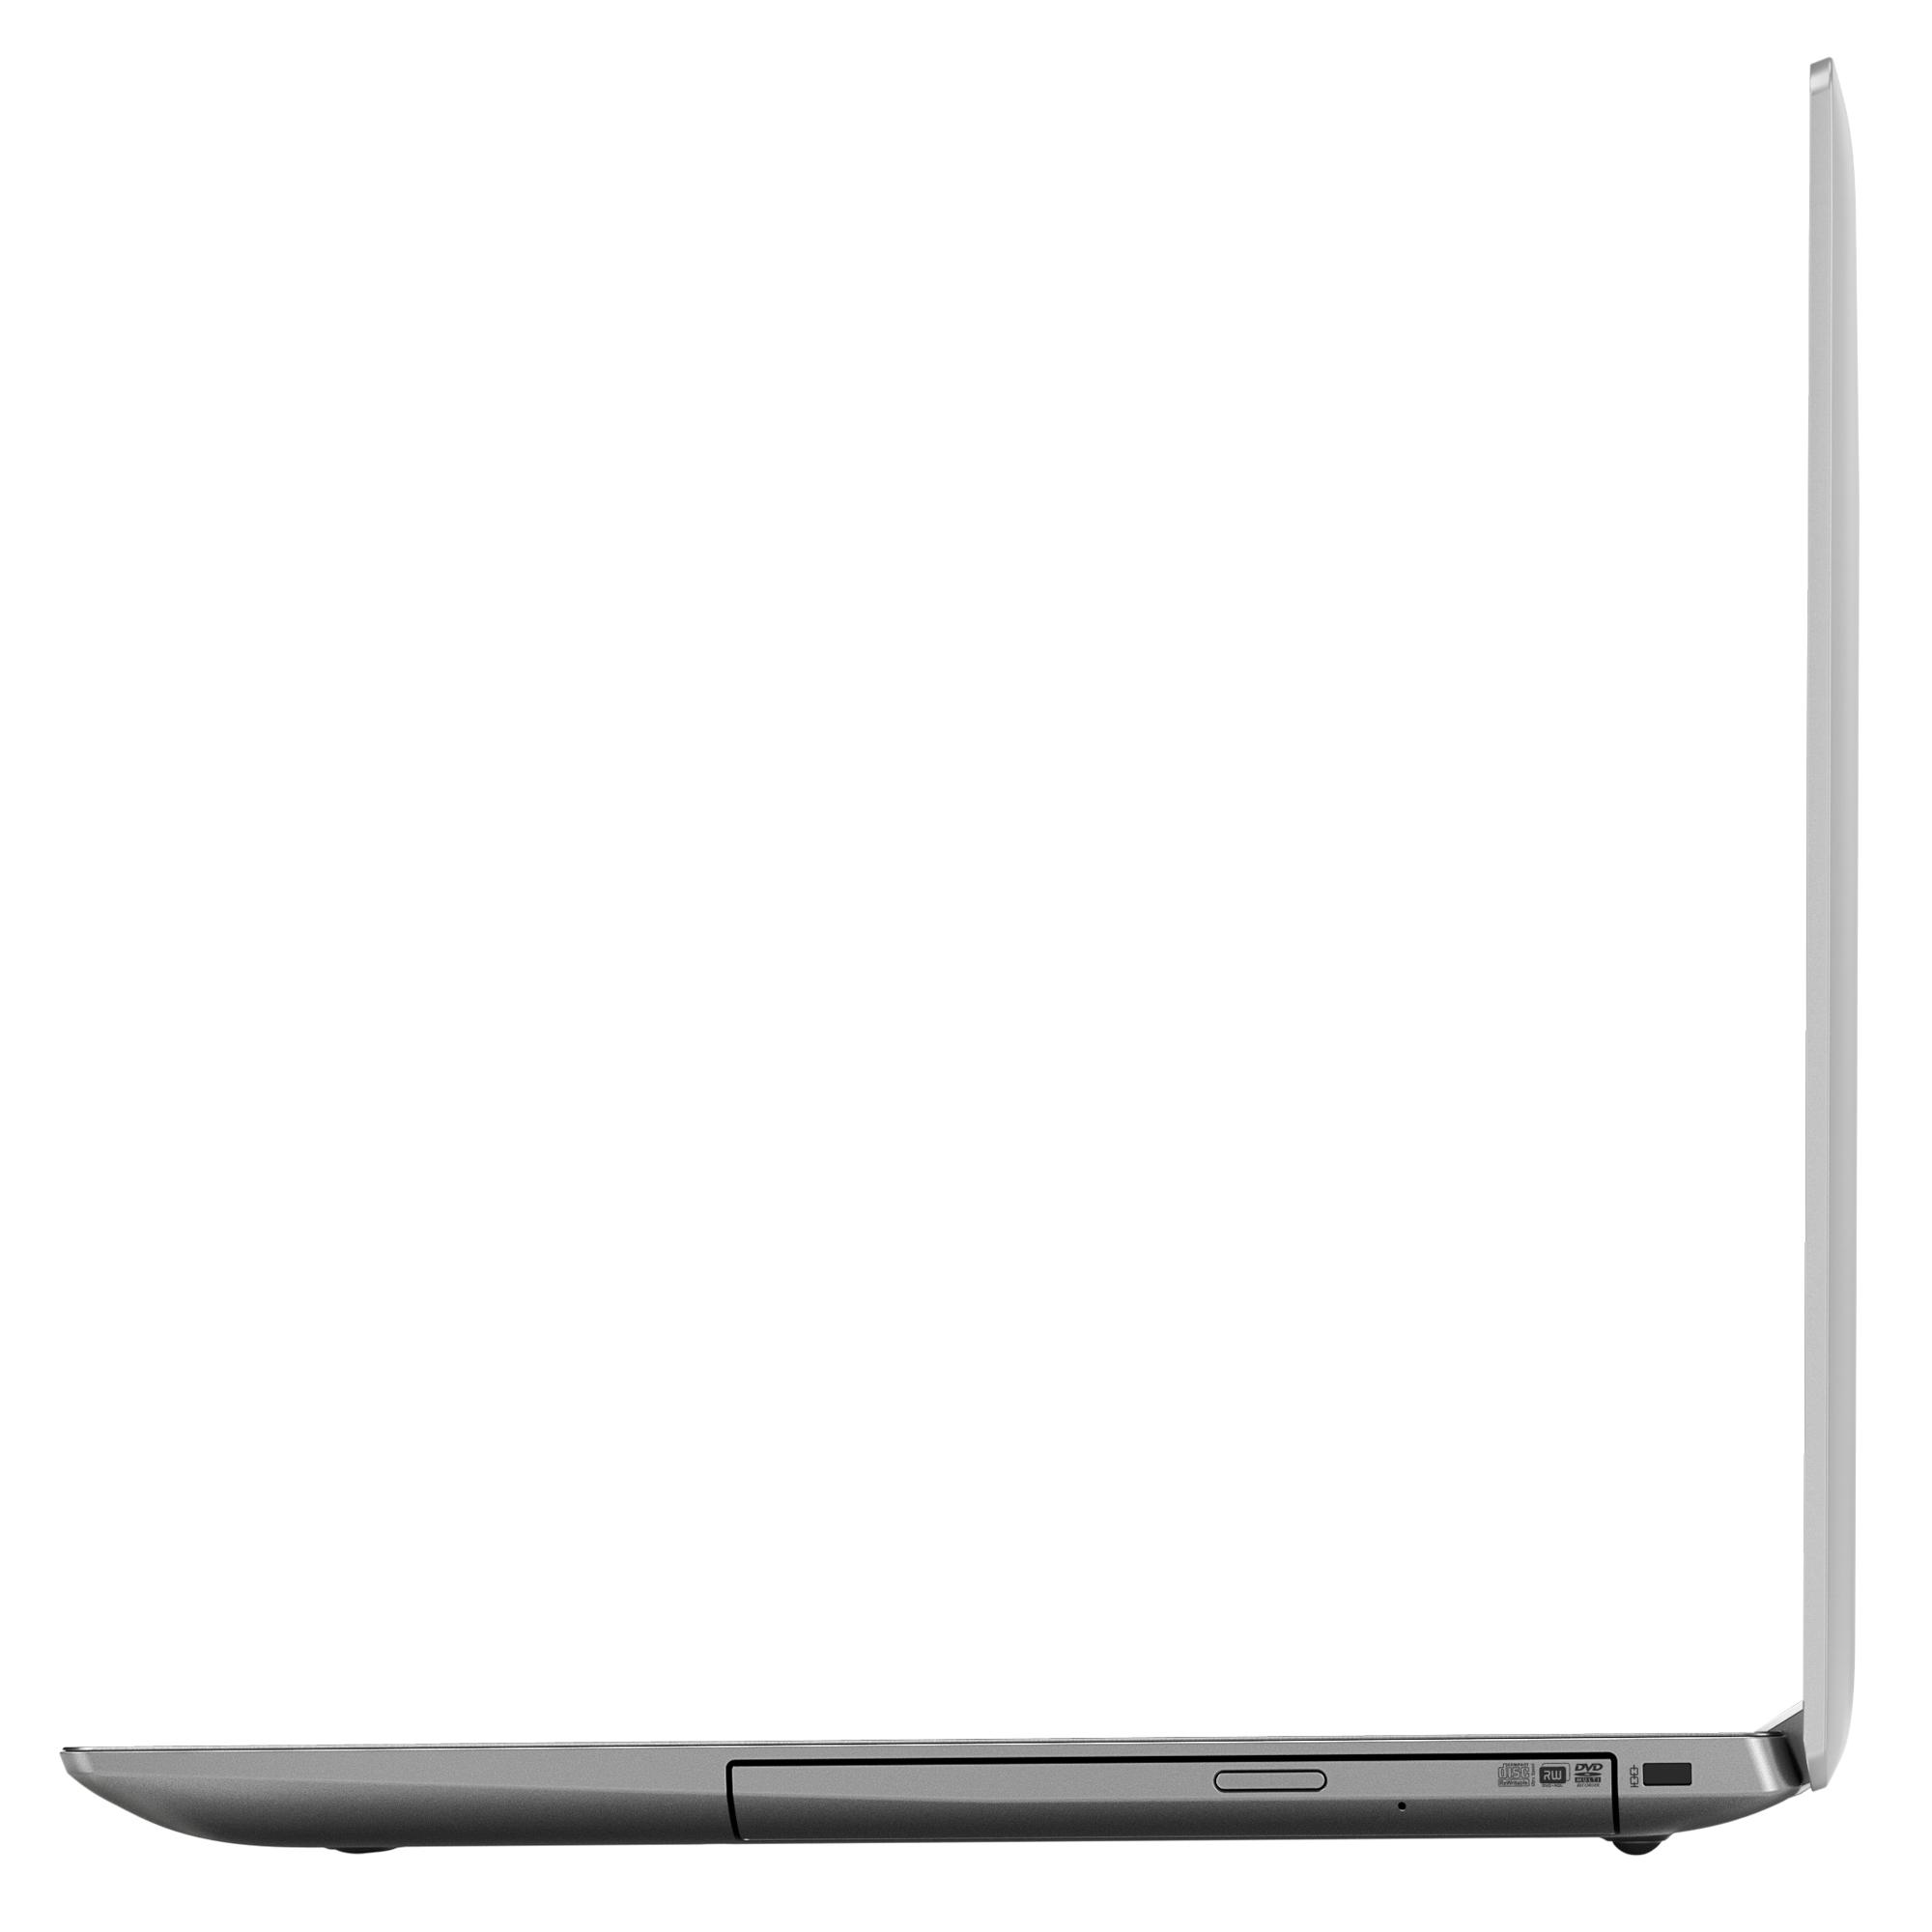 Фото  Ноутбук Lenovo ideapad 330-15 Platinum Grey (81DC012JRA)